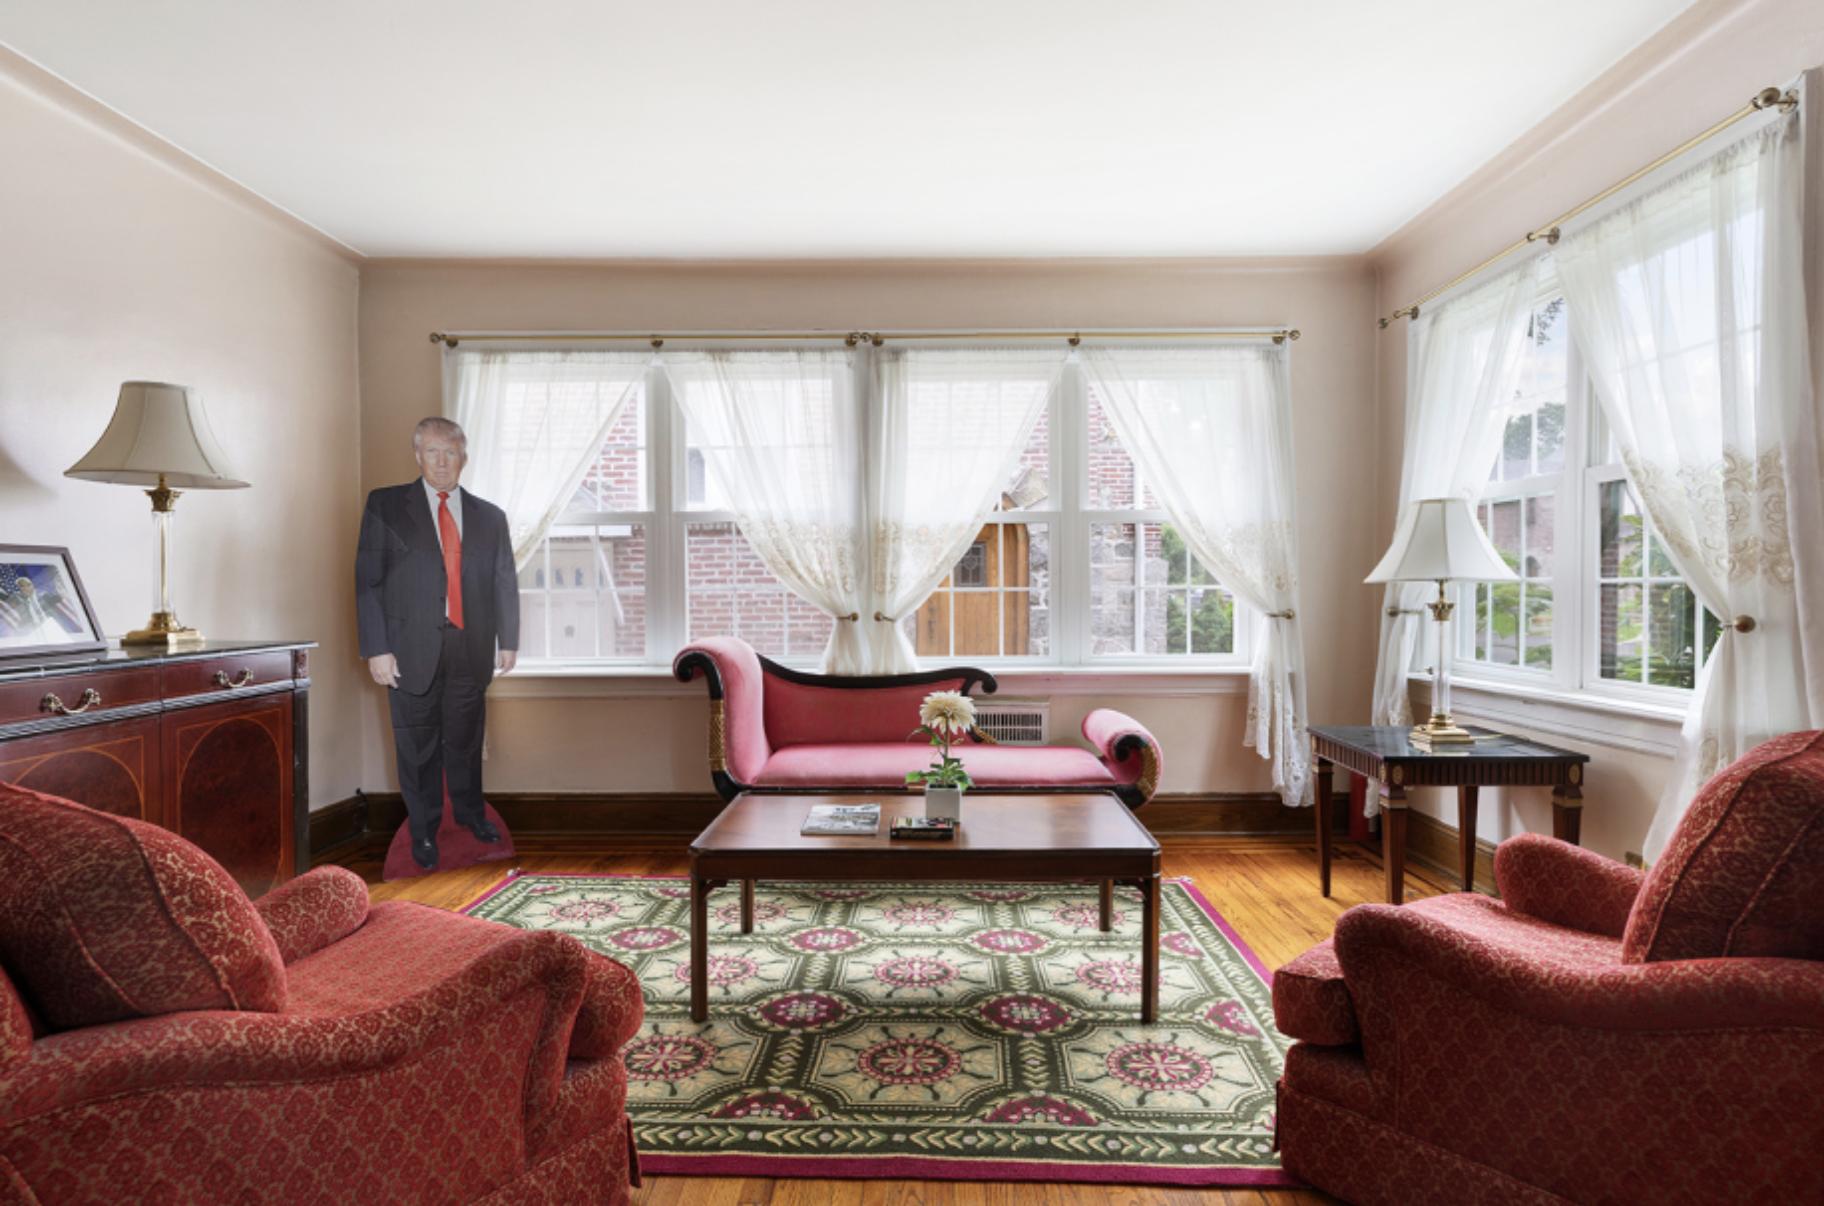 A cardboard cutout of Trump stands near the living room window. Photo via Compass.